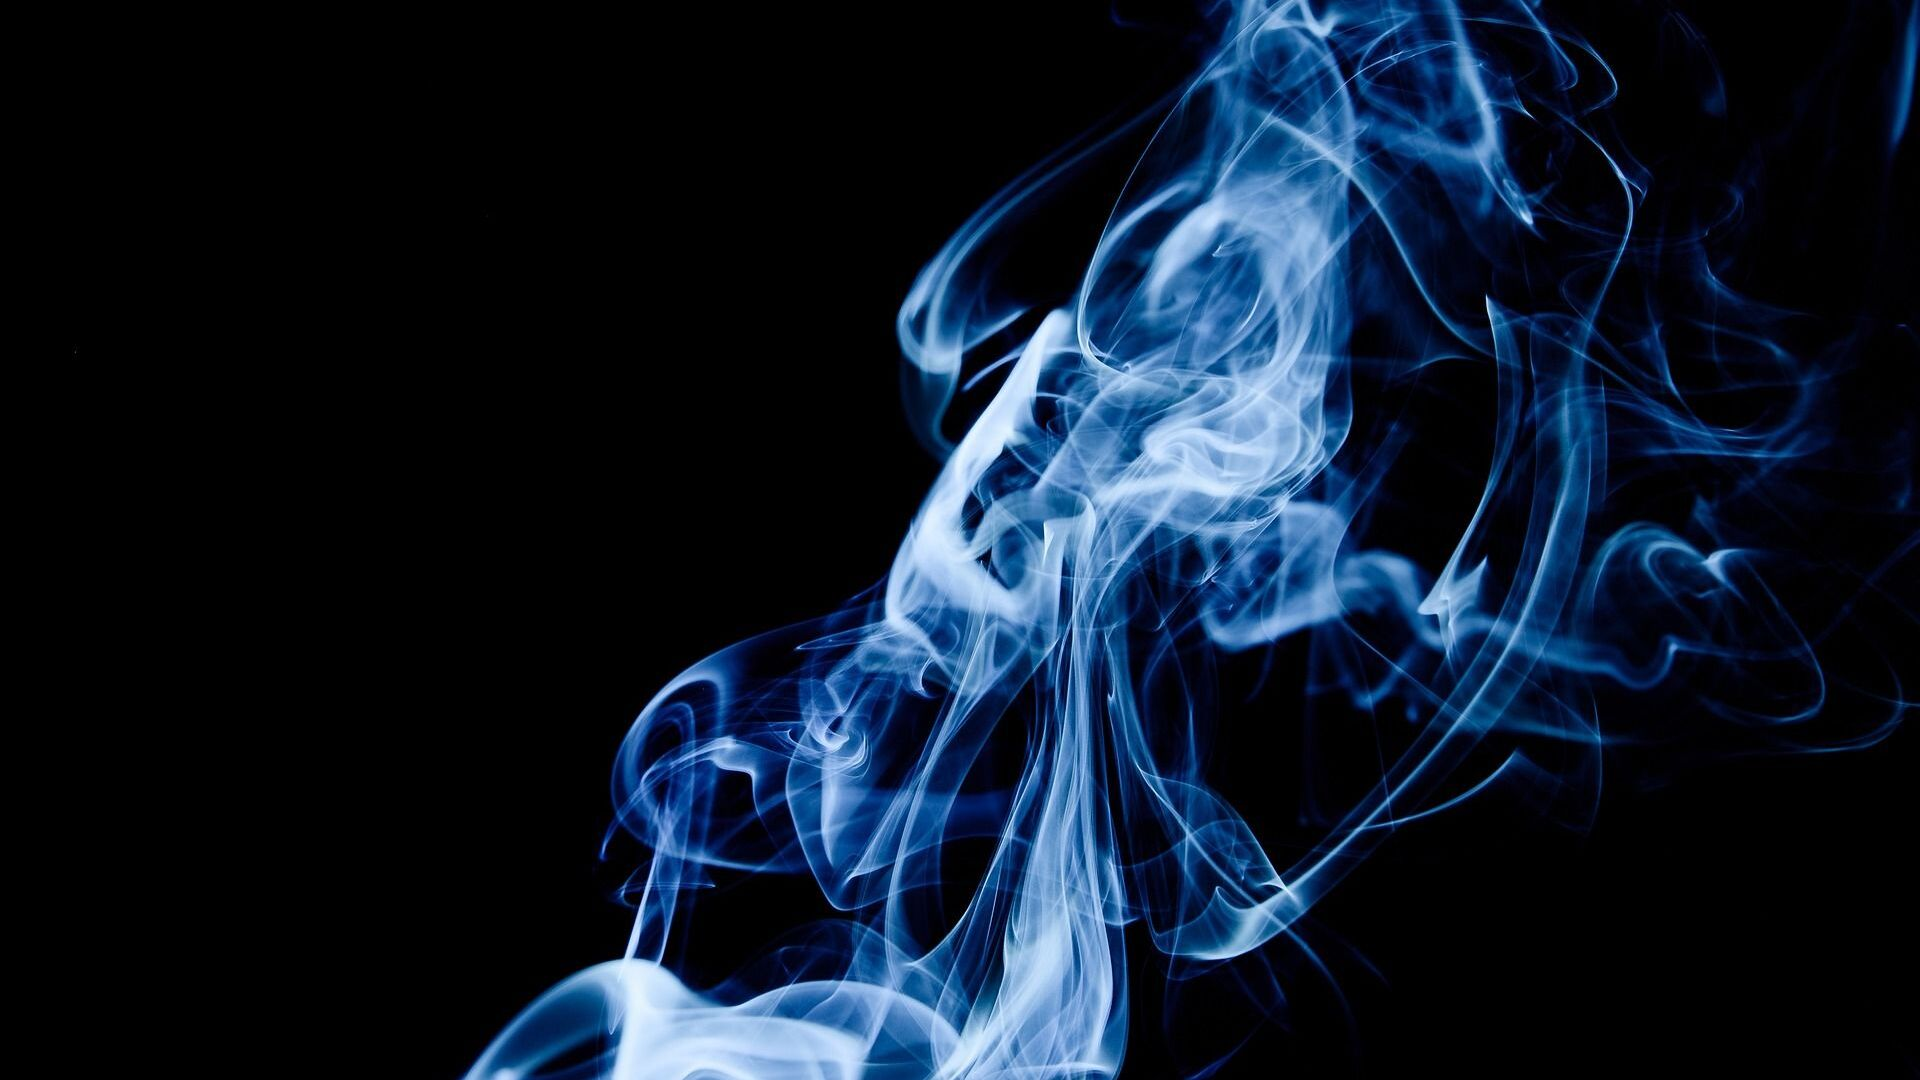 Imagen referencial de humo de tabaco - Sputnik Mundo, 1920, 26.07.2021